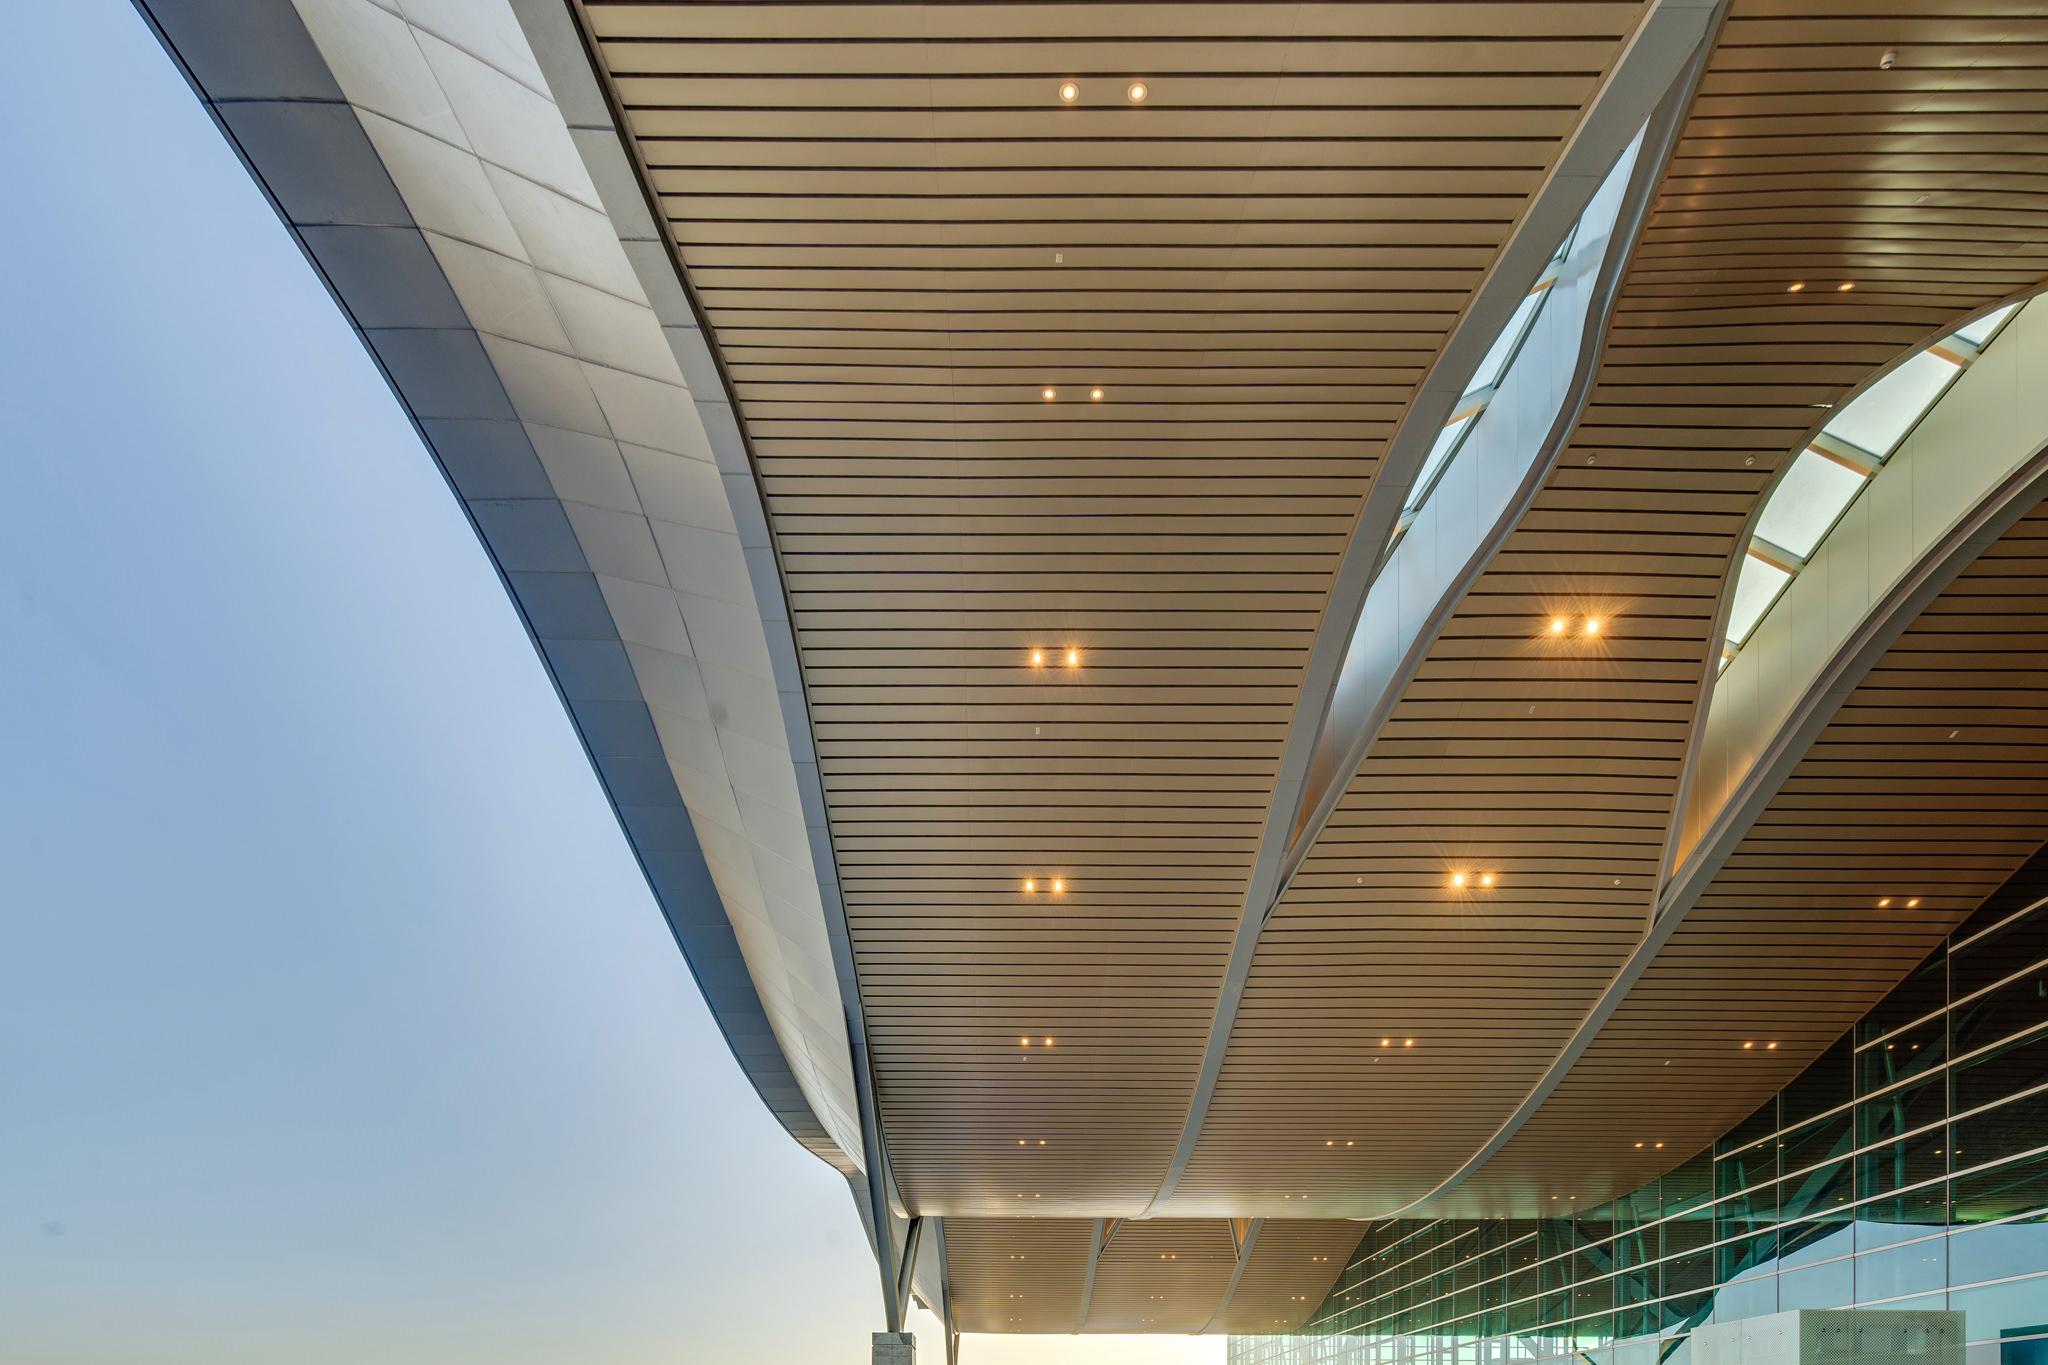 20180626 - Cam Ranh Airport - Architecture - 0062.jpg